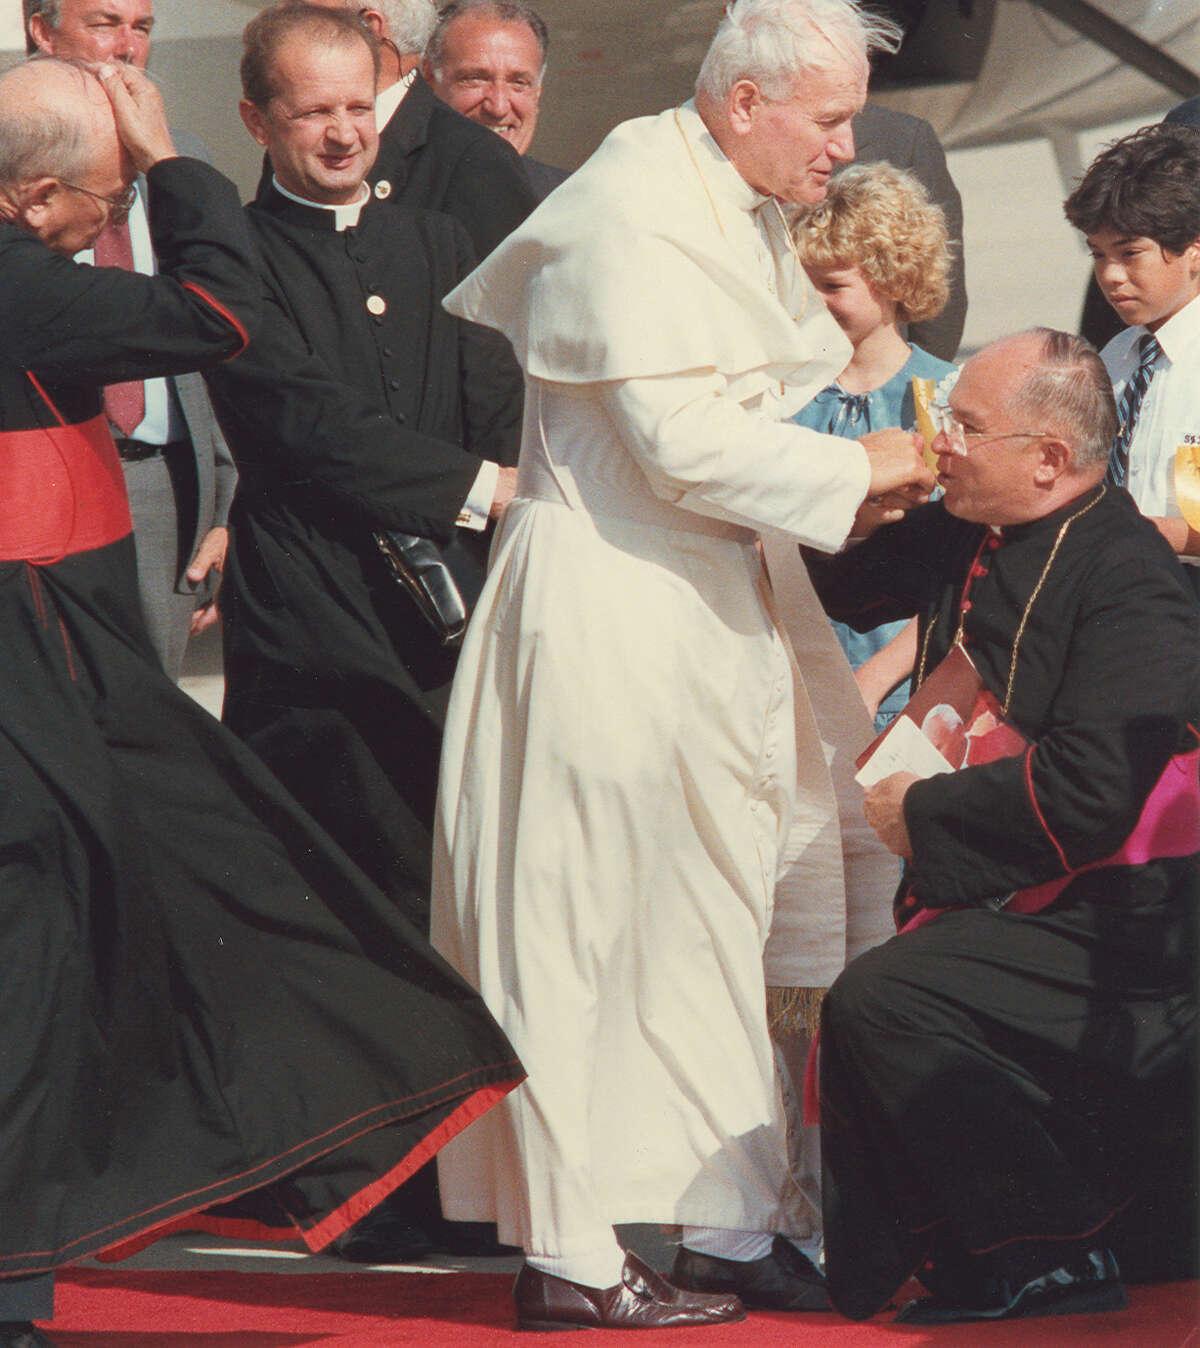 Archbishop Patrick Flores greets Pope John Paul II at Kelly Air Force Base September 13, 1987.